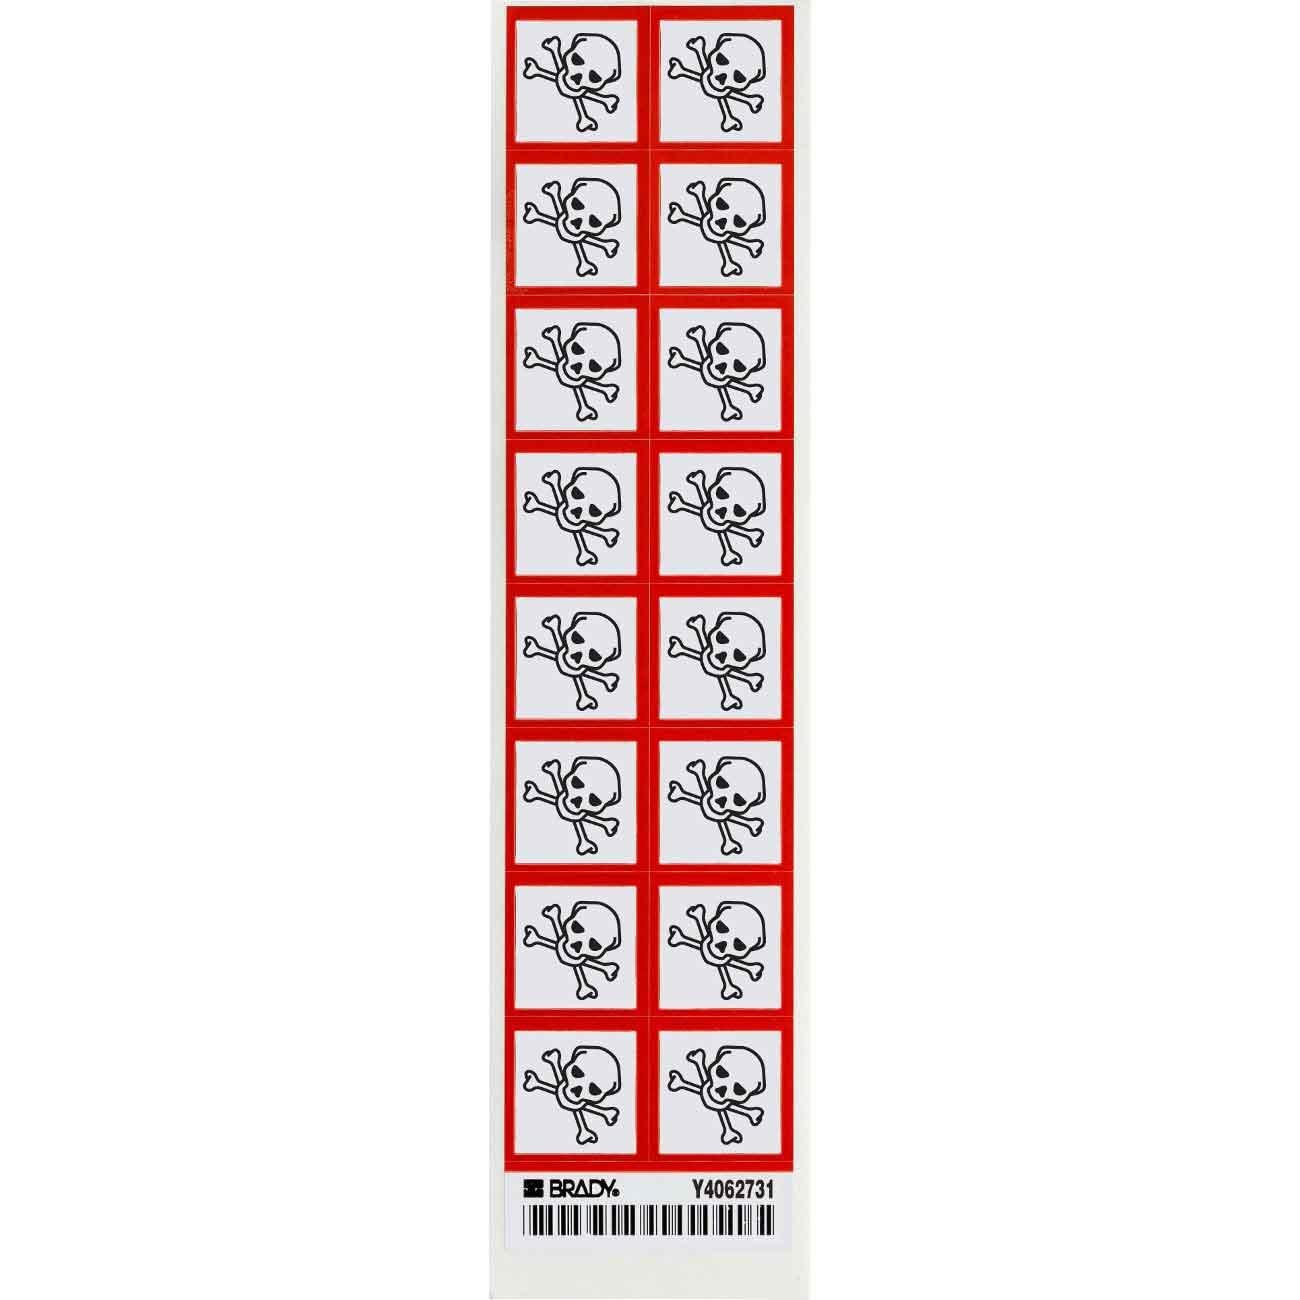 Brady Part 118846 Severe Toxic Hazard Symbol Ghs Labels Bradyid